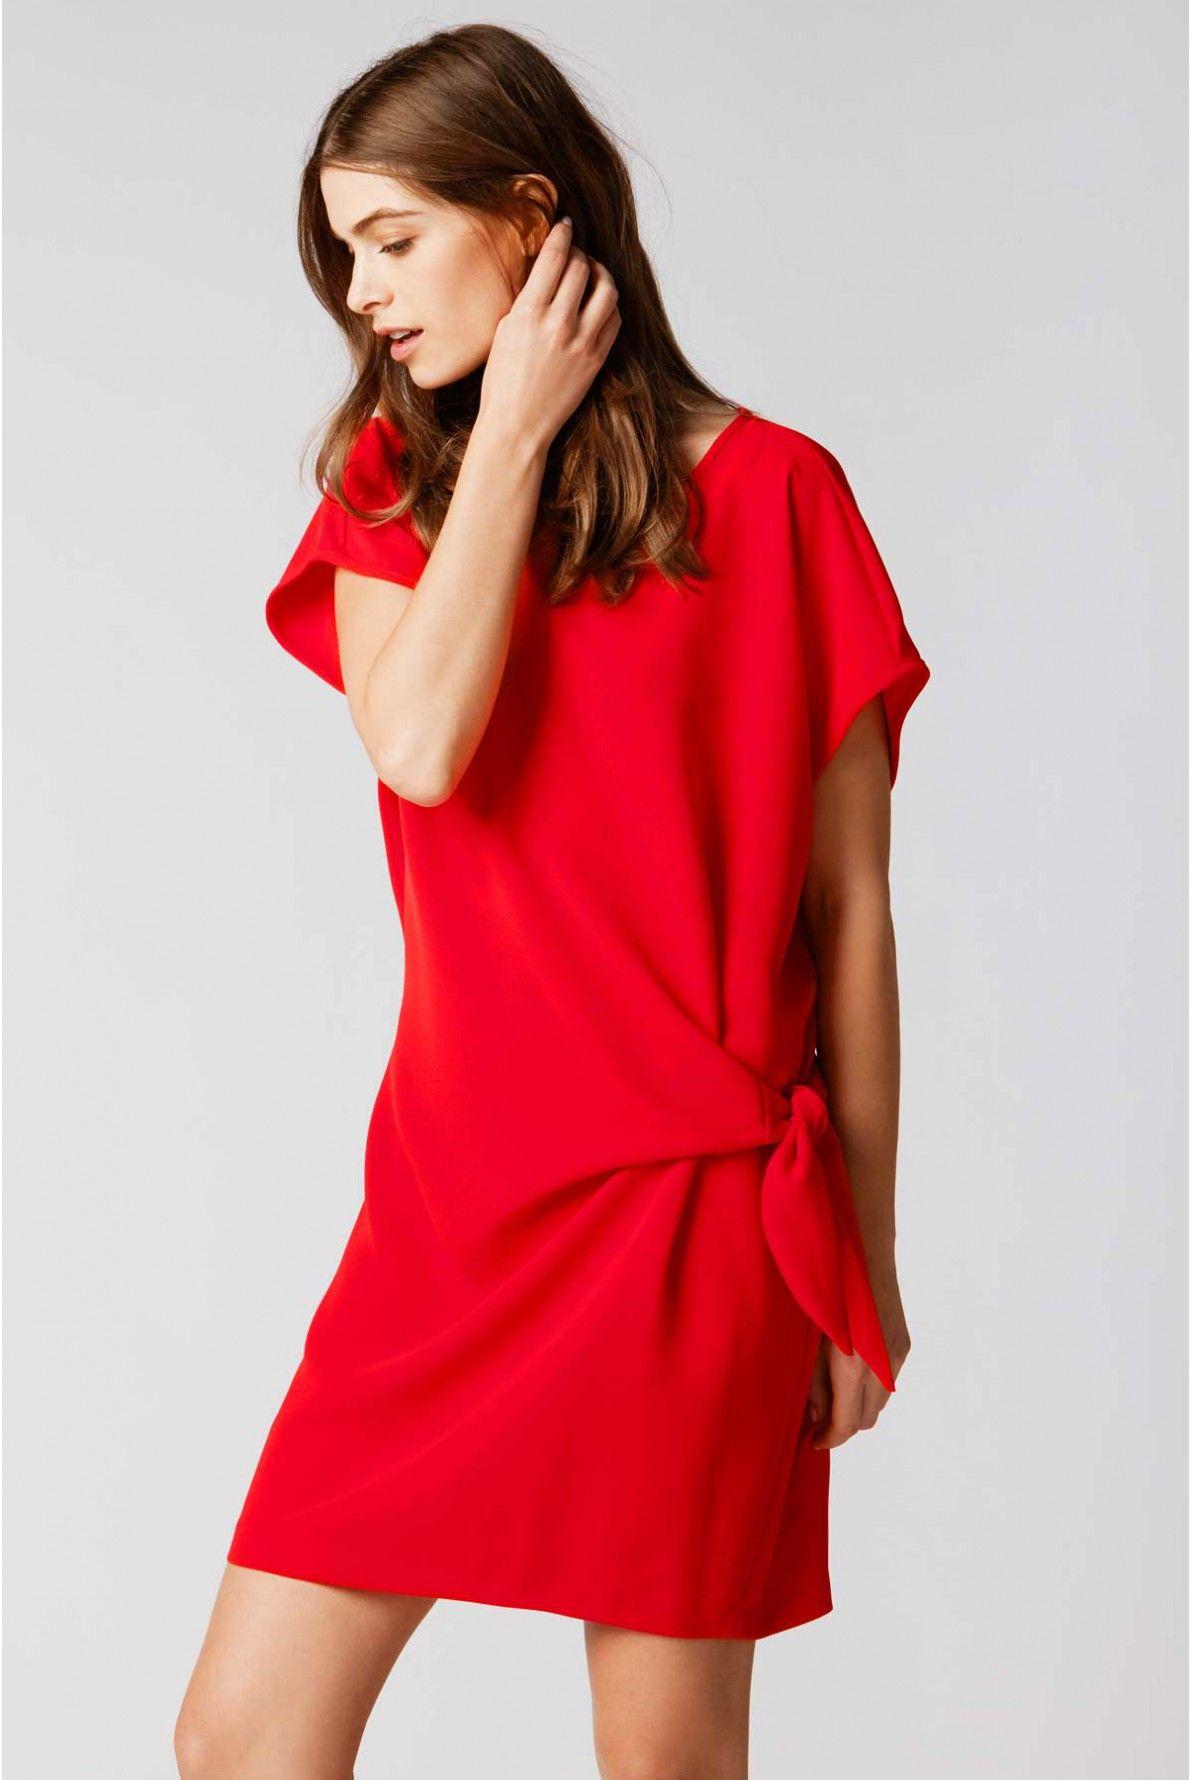 5c6853d0576f8 Robe camden, rouge vif   gerard darel 1   Printemps   Eté 2016 ...